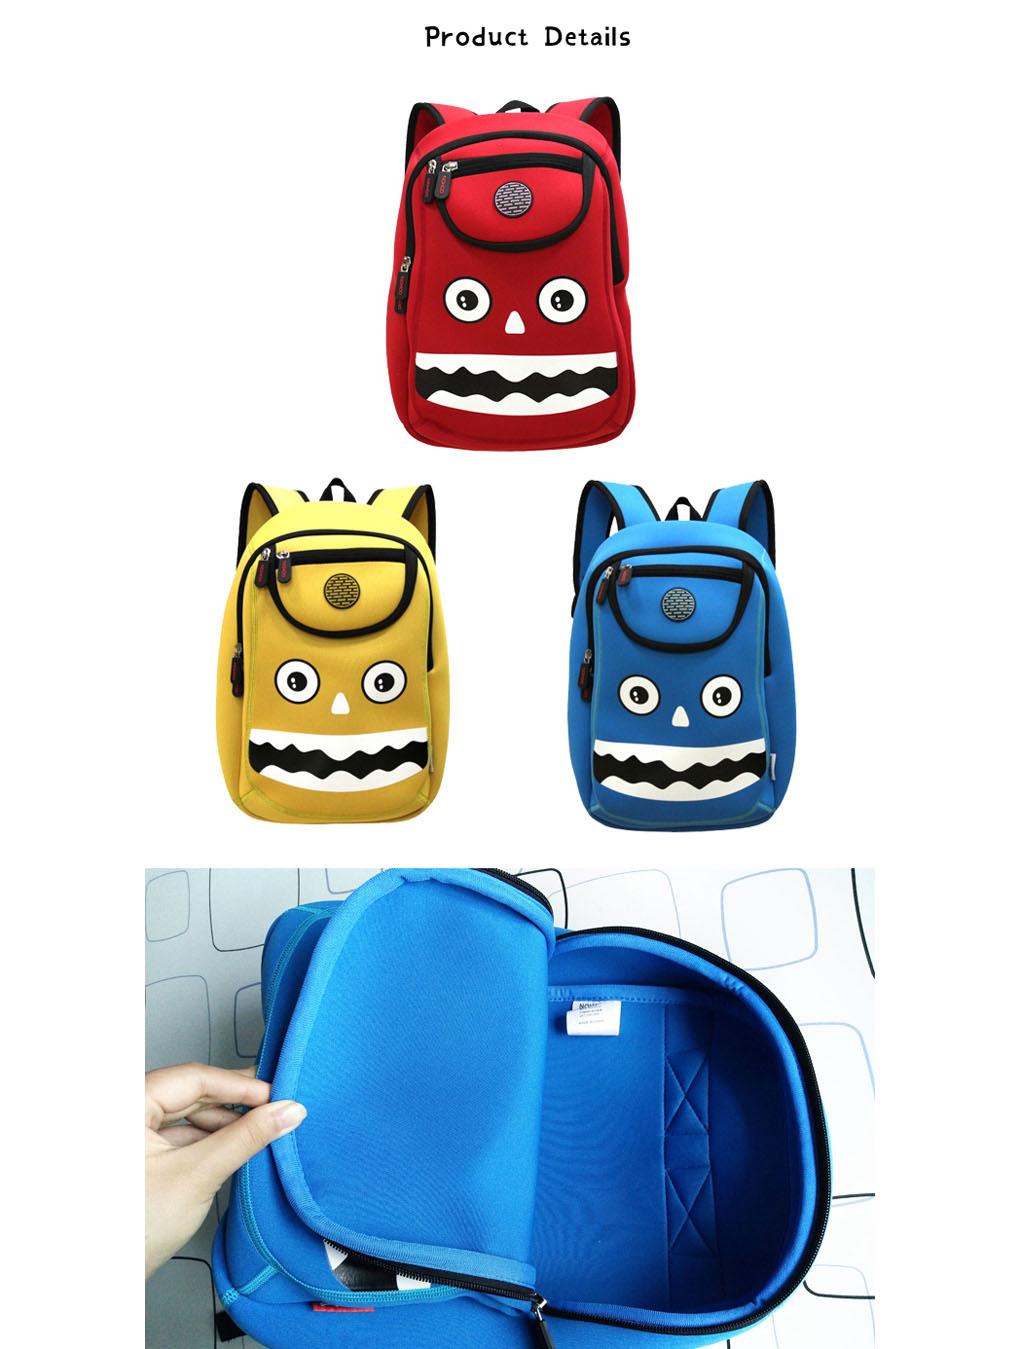 Nohoo Children Products-High Quality Nohoo Factory Cartoon School Outdoor Kids Bag